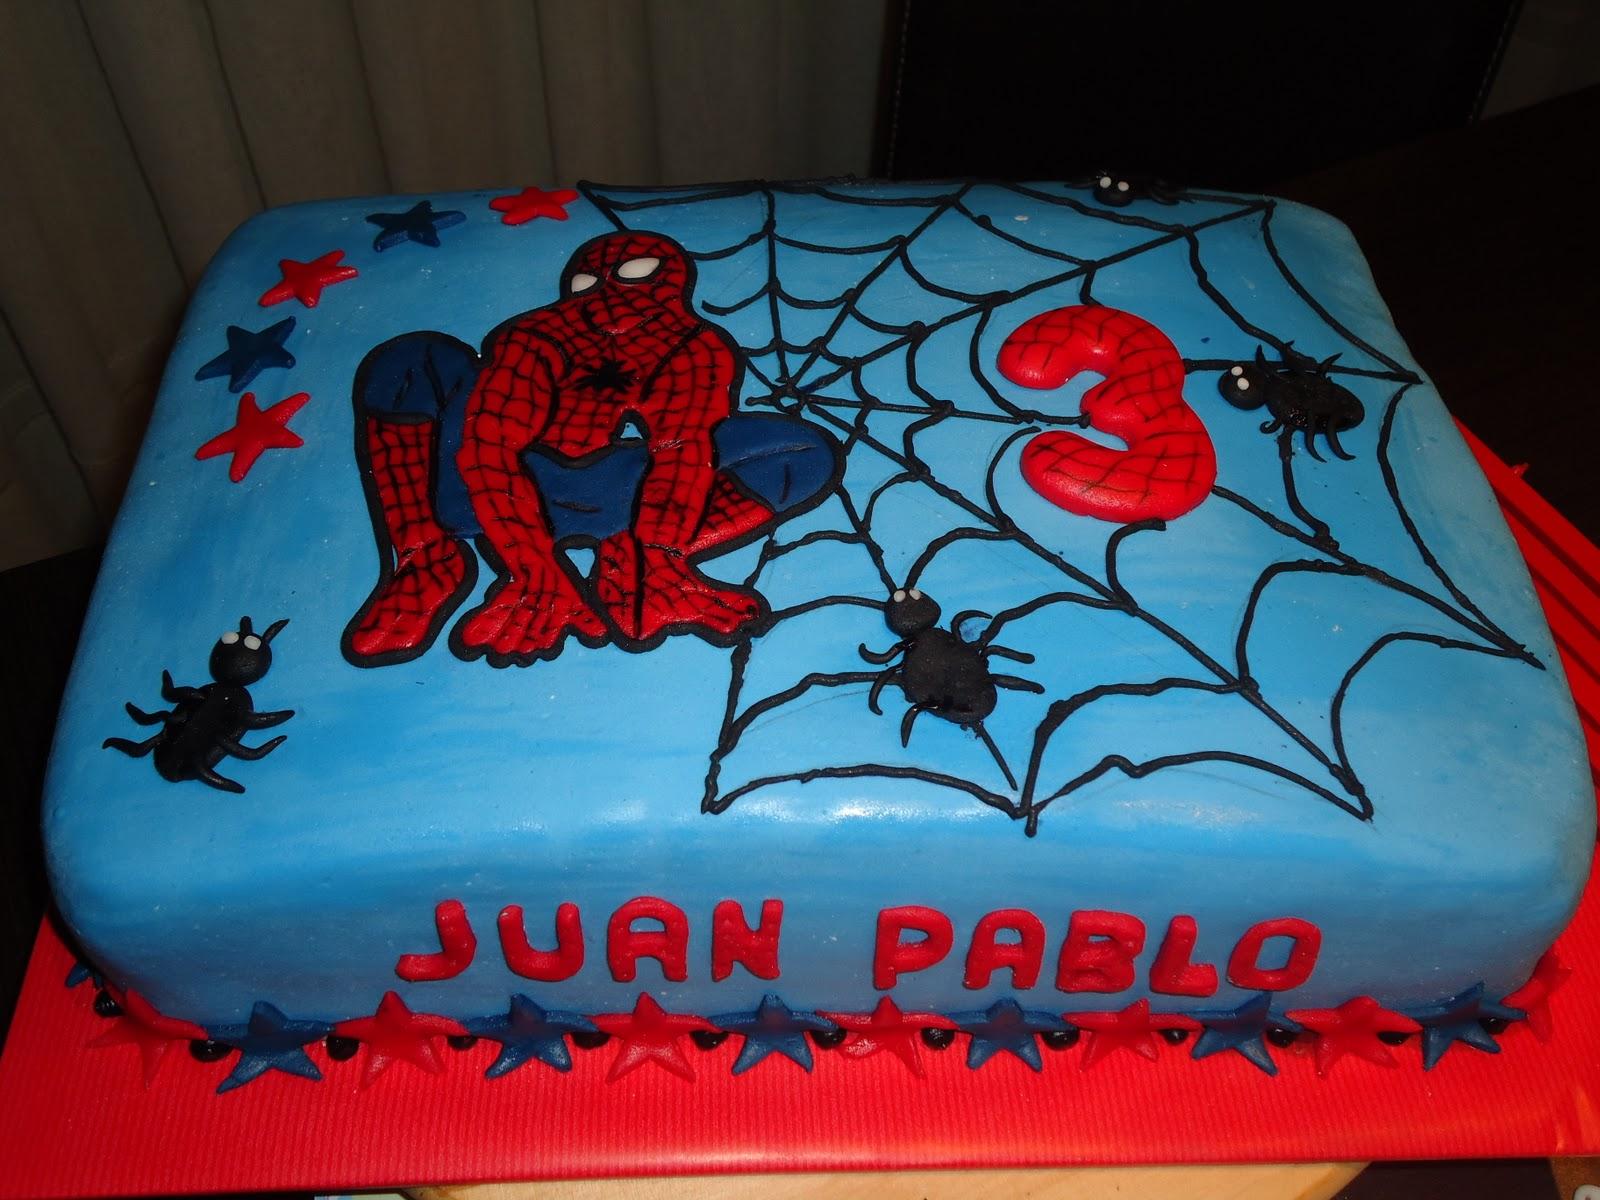 Galerias de tortas para fiestas infantiles - Fiestas